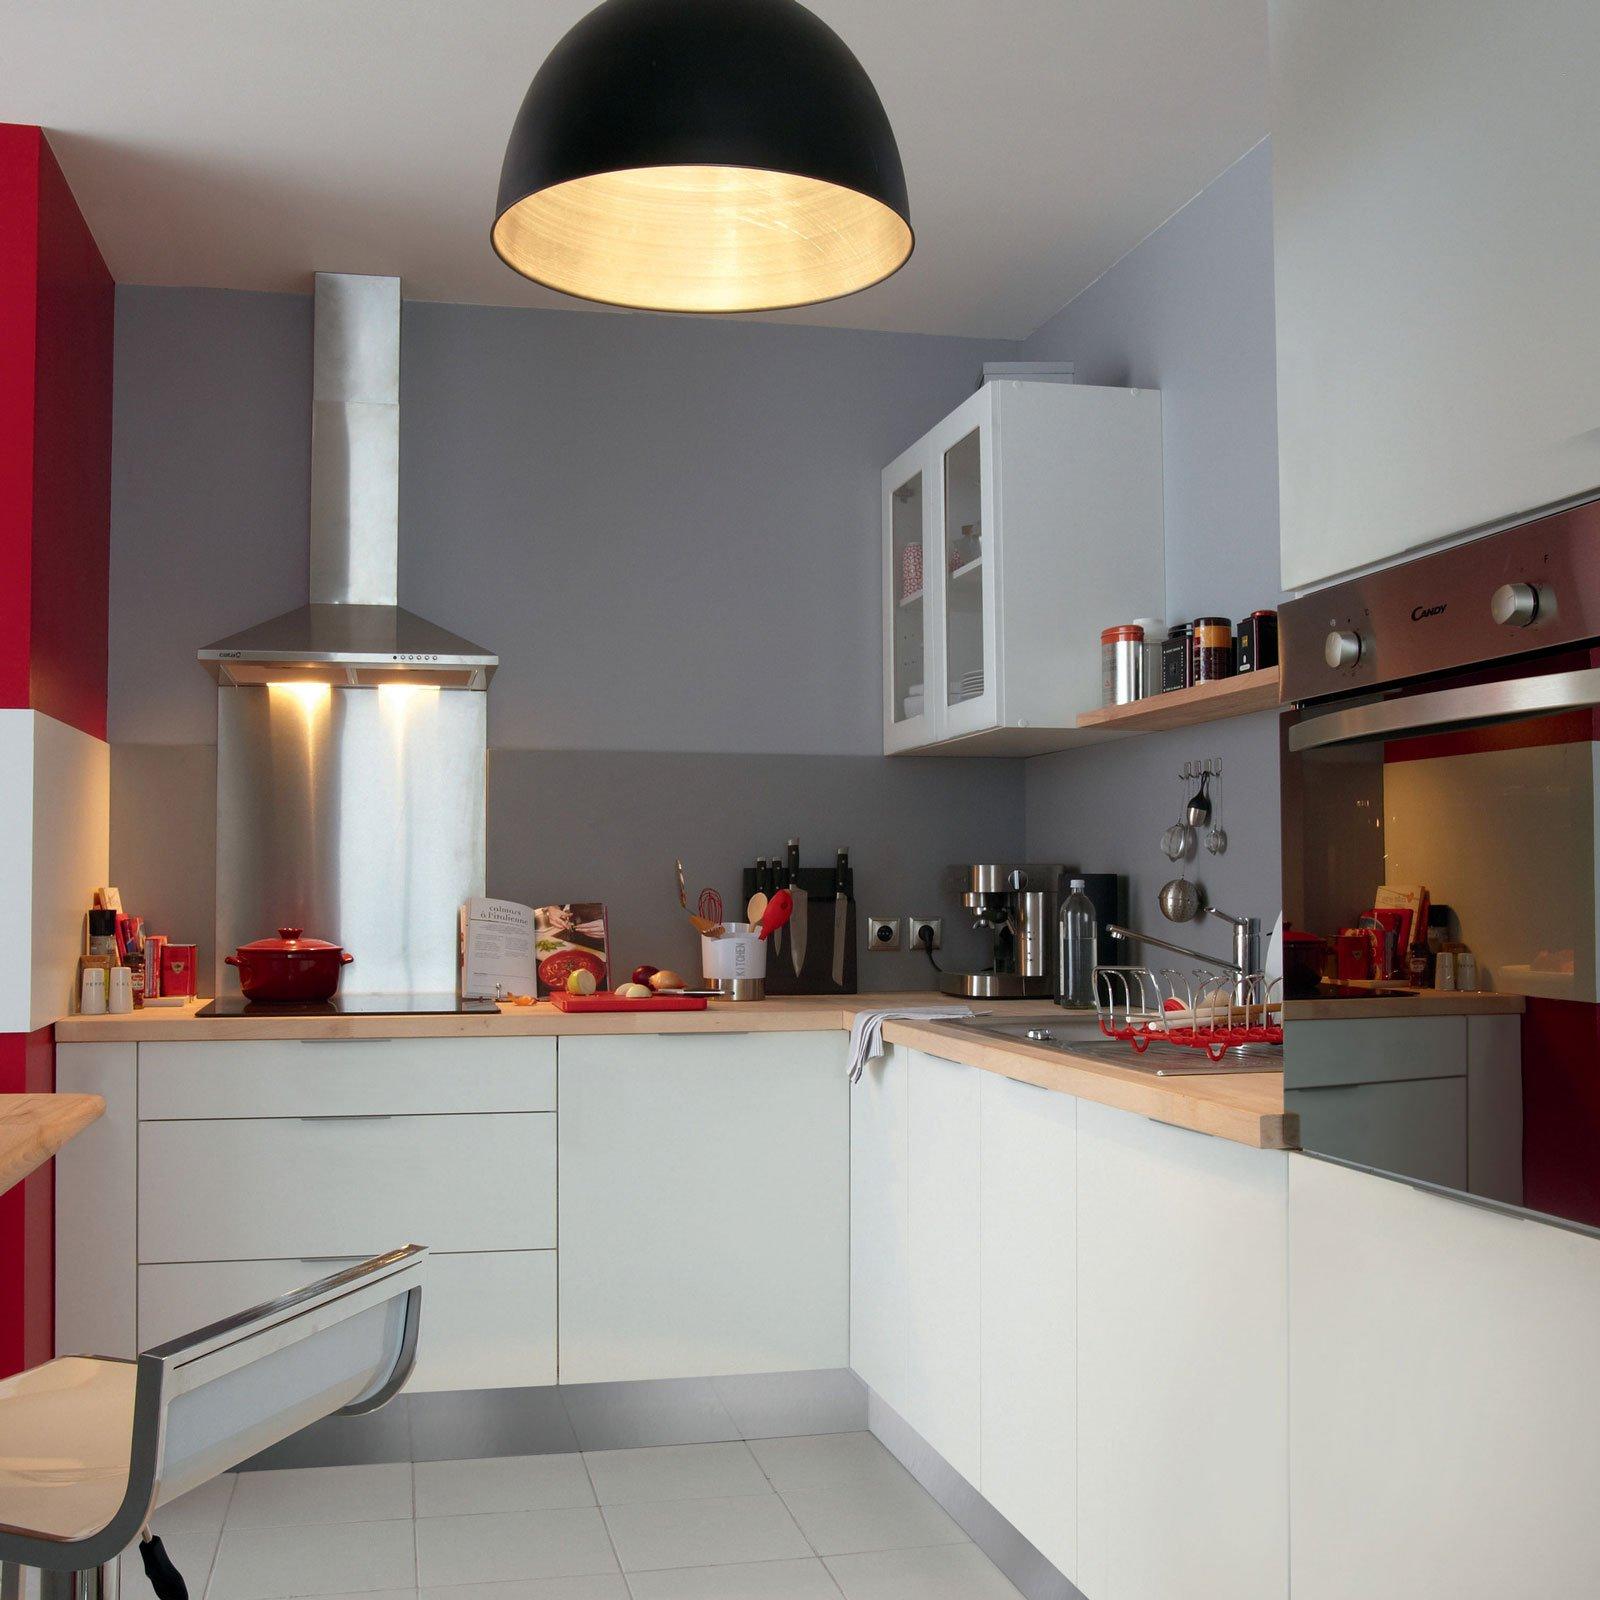 Cucina in melaminico economica resistente in tante versioni cose di casa - Aran cucine prezzi 2016 ...